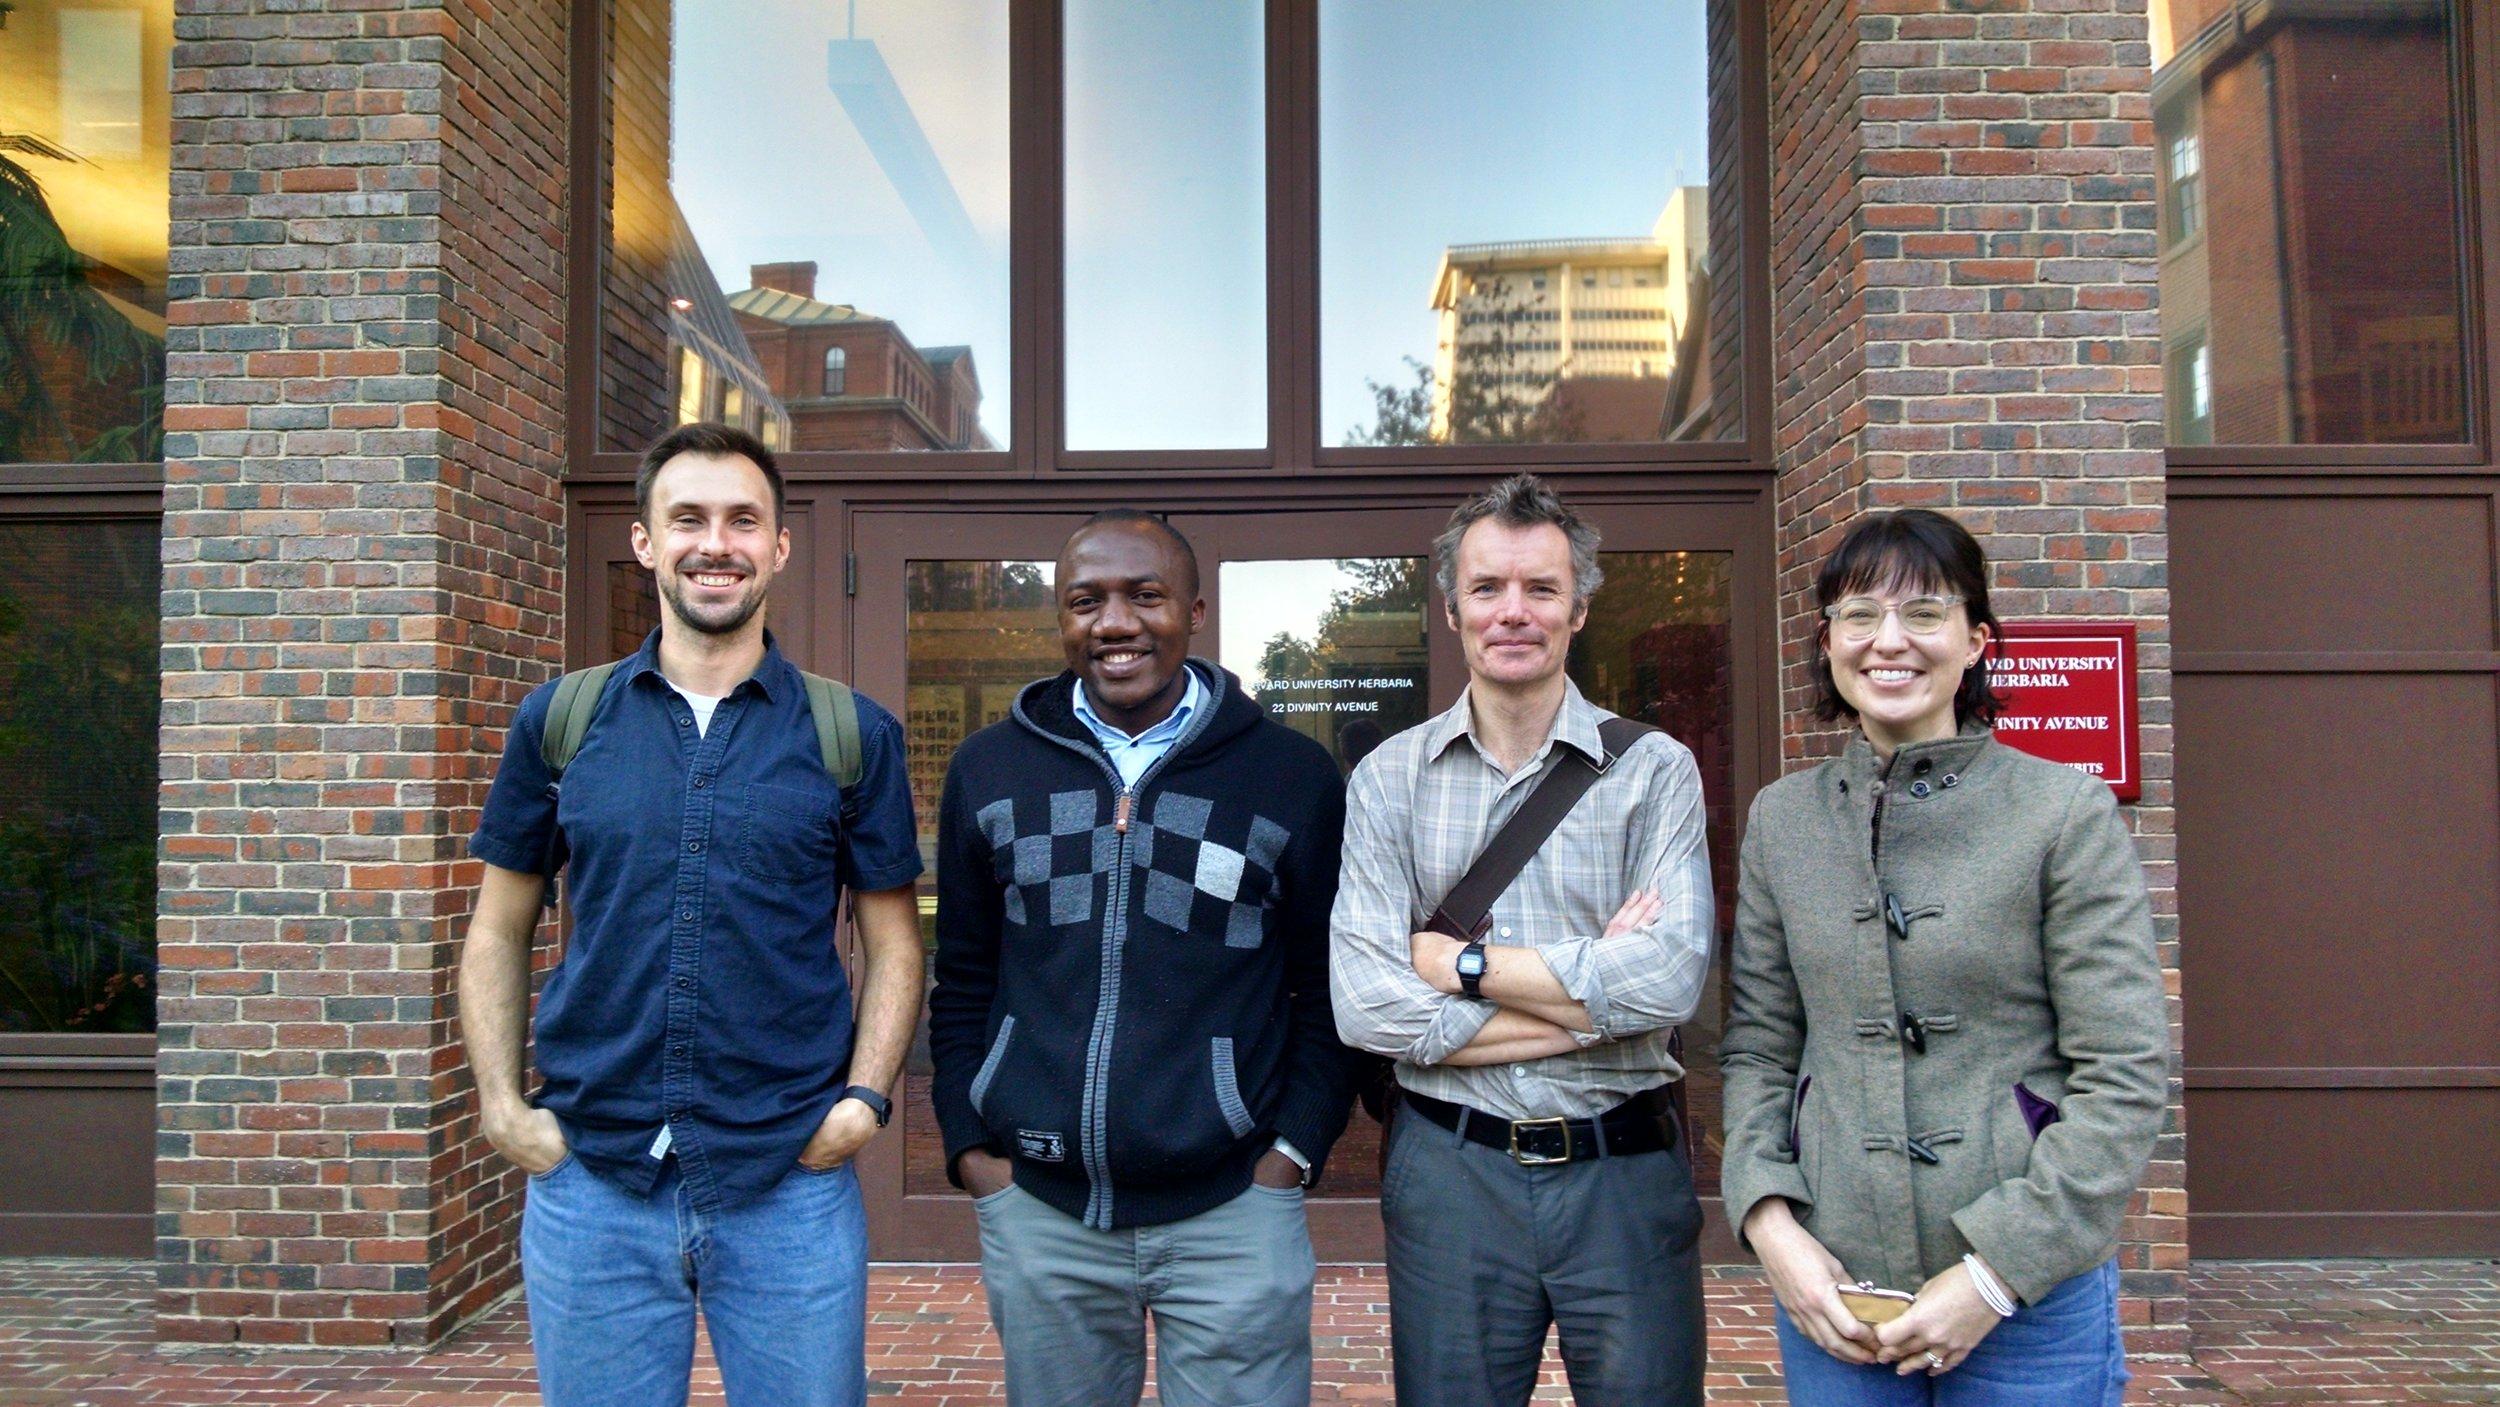 Jonathan Davies' lab at the Harvard University Herbaria: from left to right, Max Farrell, Barnabas Daru, Jonathan Davies, Emily Meineke